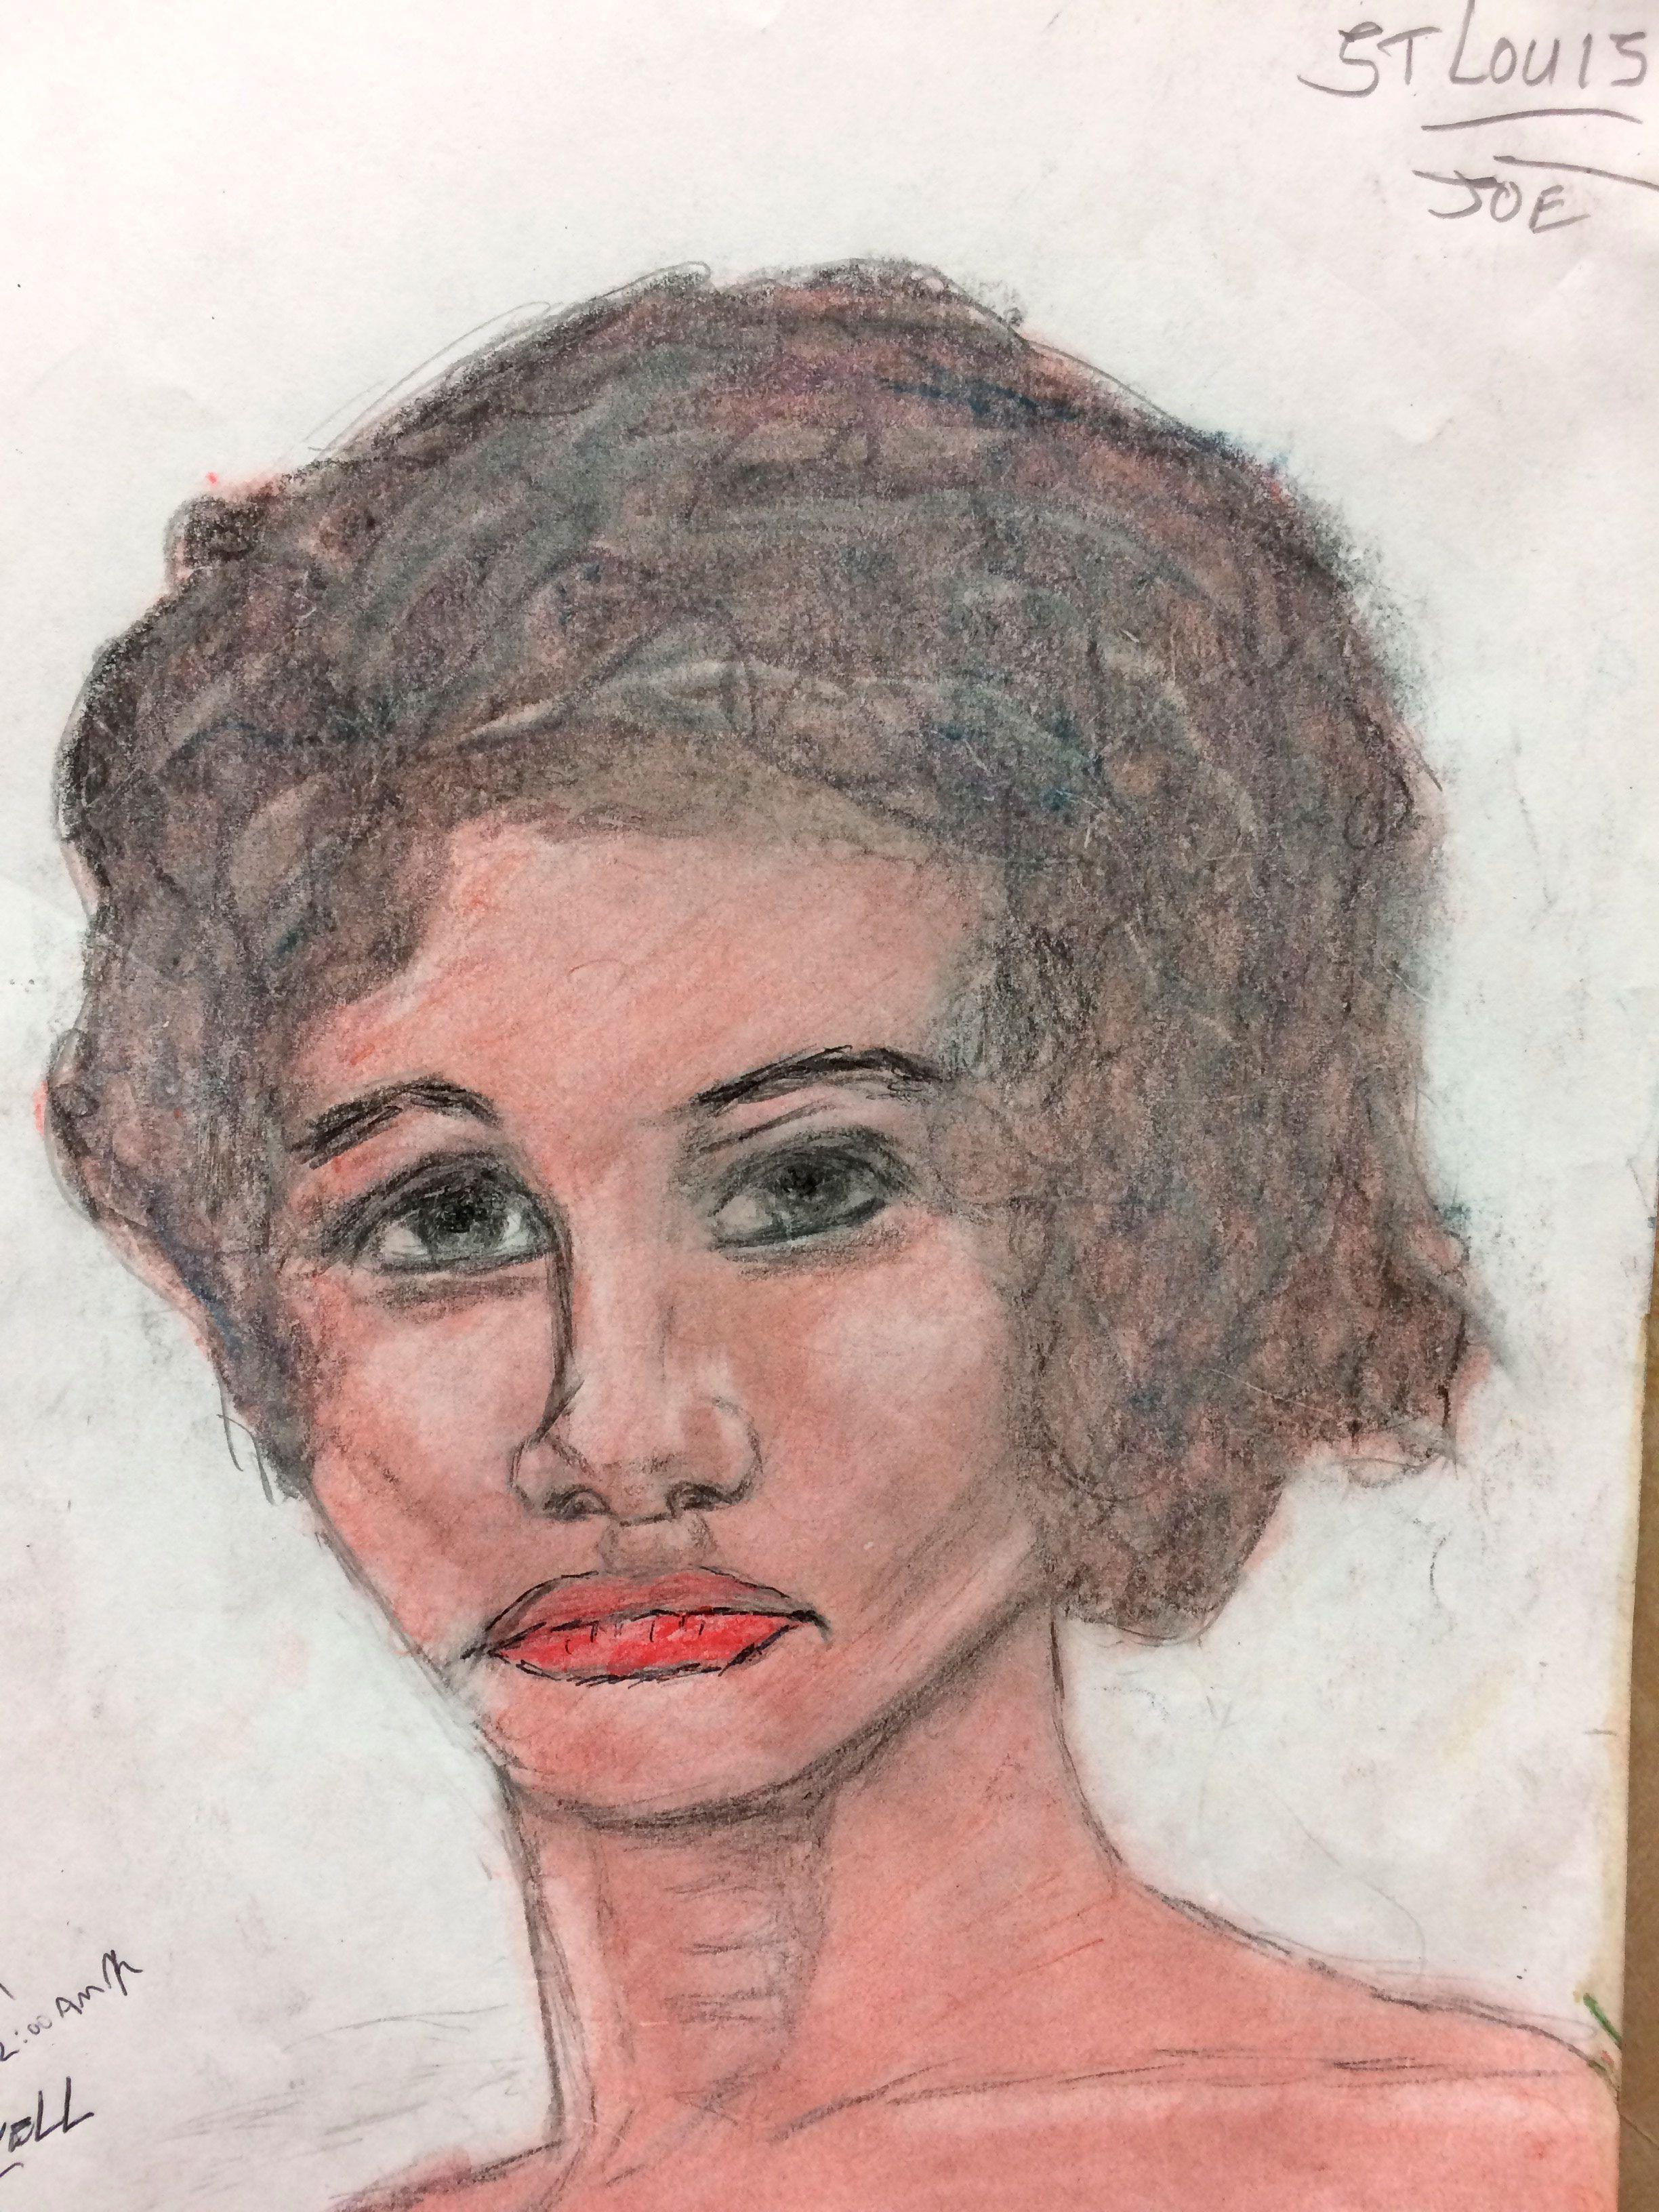 Granite City, Illinois. Mujer de 26 años, asesinada entre 1976 y 1979. La conoció en St. Louis, Missouri, la mató en East St. Louis, Illinois (FBI)